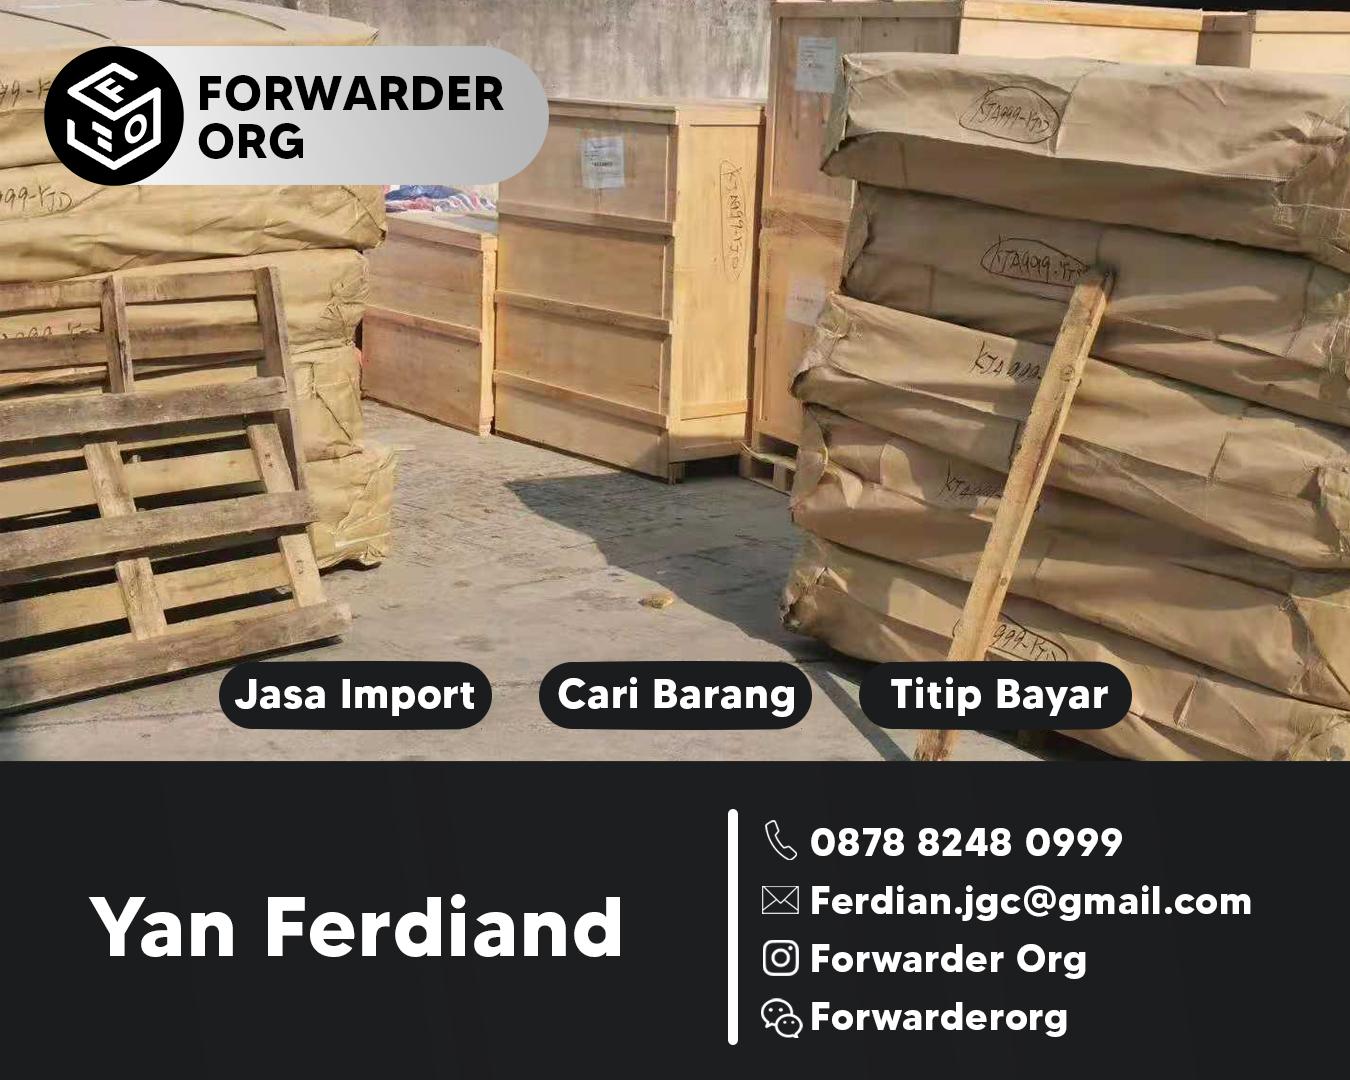 Jasa Import Malaysia Harga Istimewa Terpercaya | FORWARDER ORG